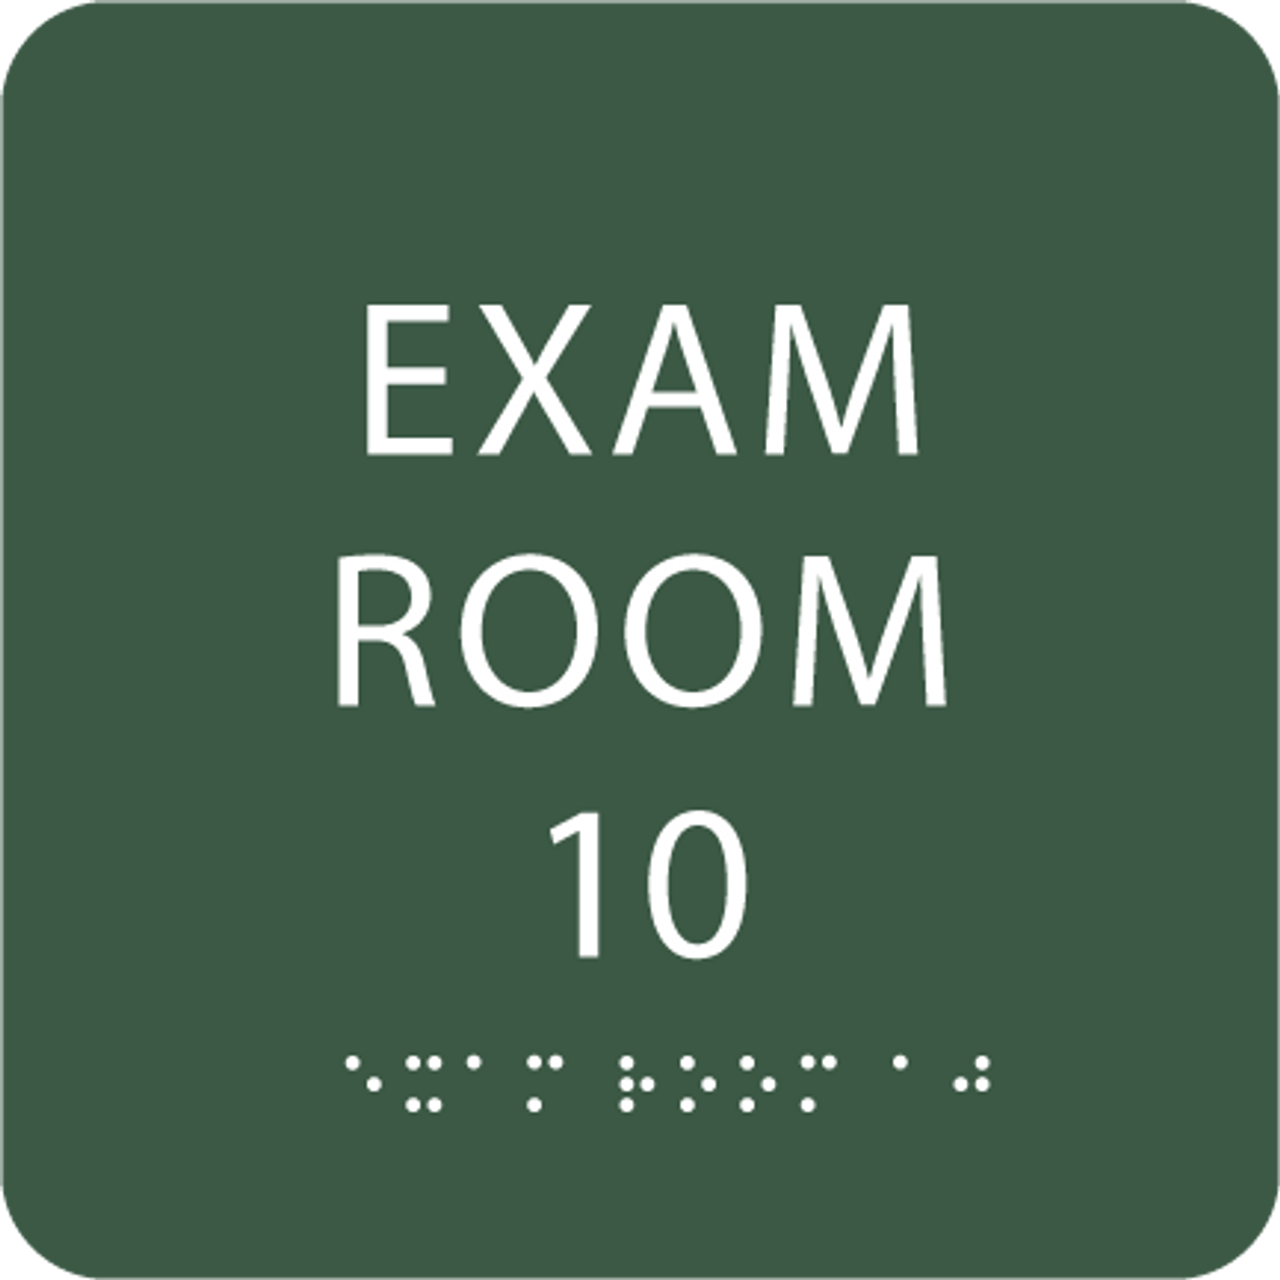 Spruce Exam Room 10 Sign w/ ADA Braille